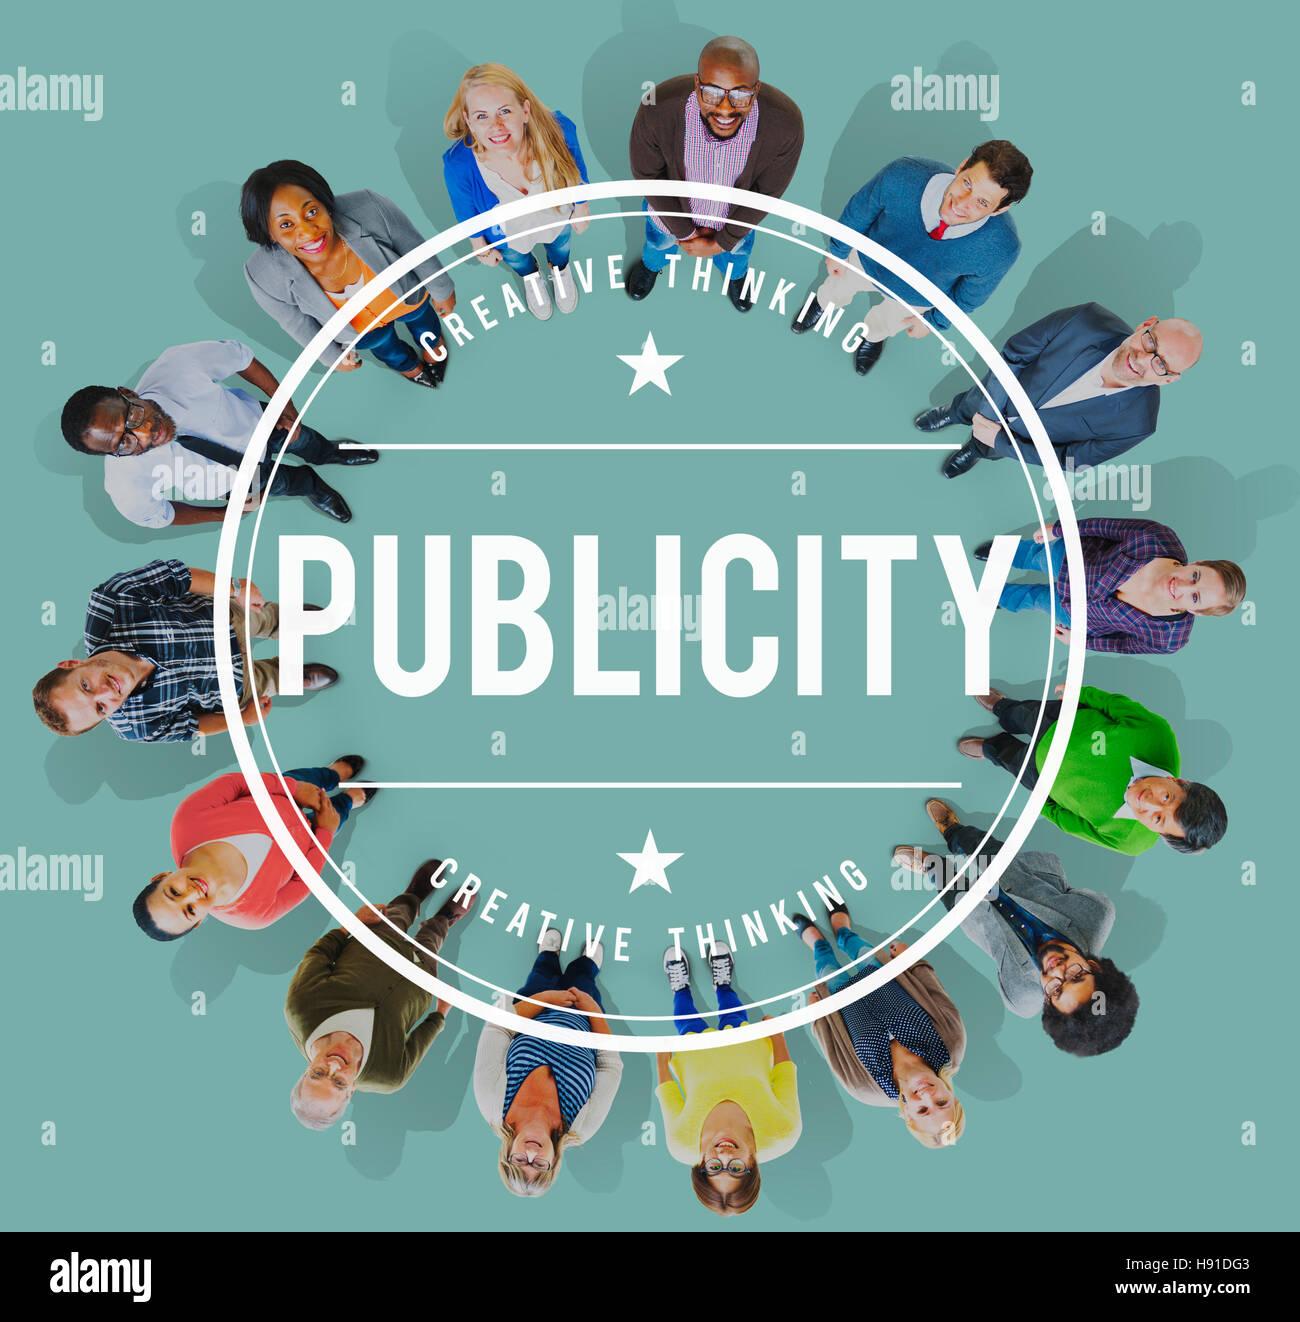 Publicity Public Attention Propaganda Boost Relation Concept - Stock Image